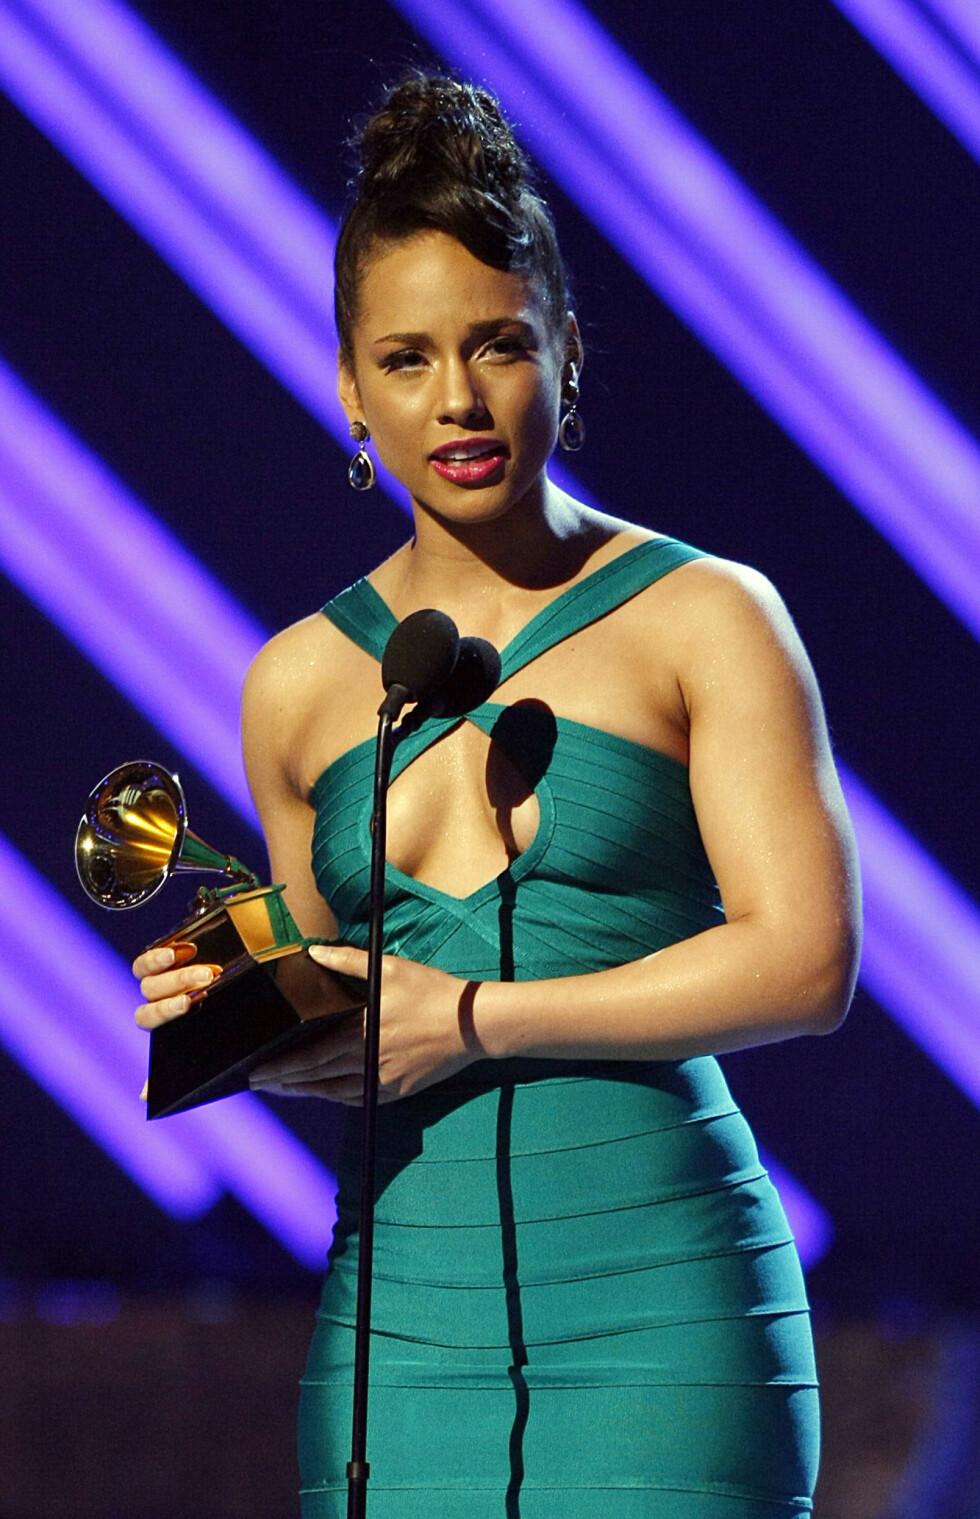 VANT PRIS: Alicia Keyes vant i kategorien Best Female R&B Vocal Performance for låten No One. Foto: NTB Scanpix